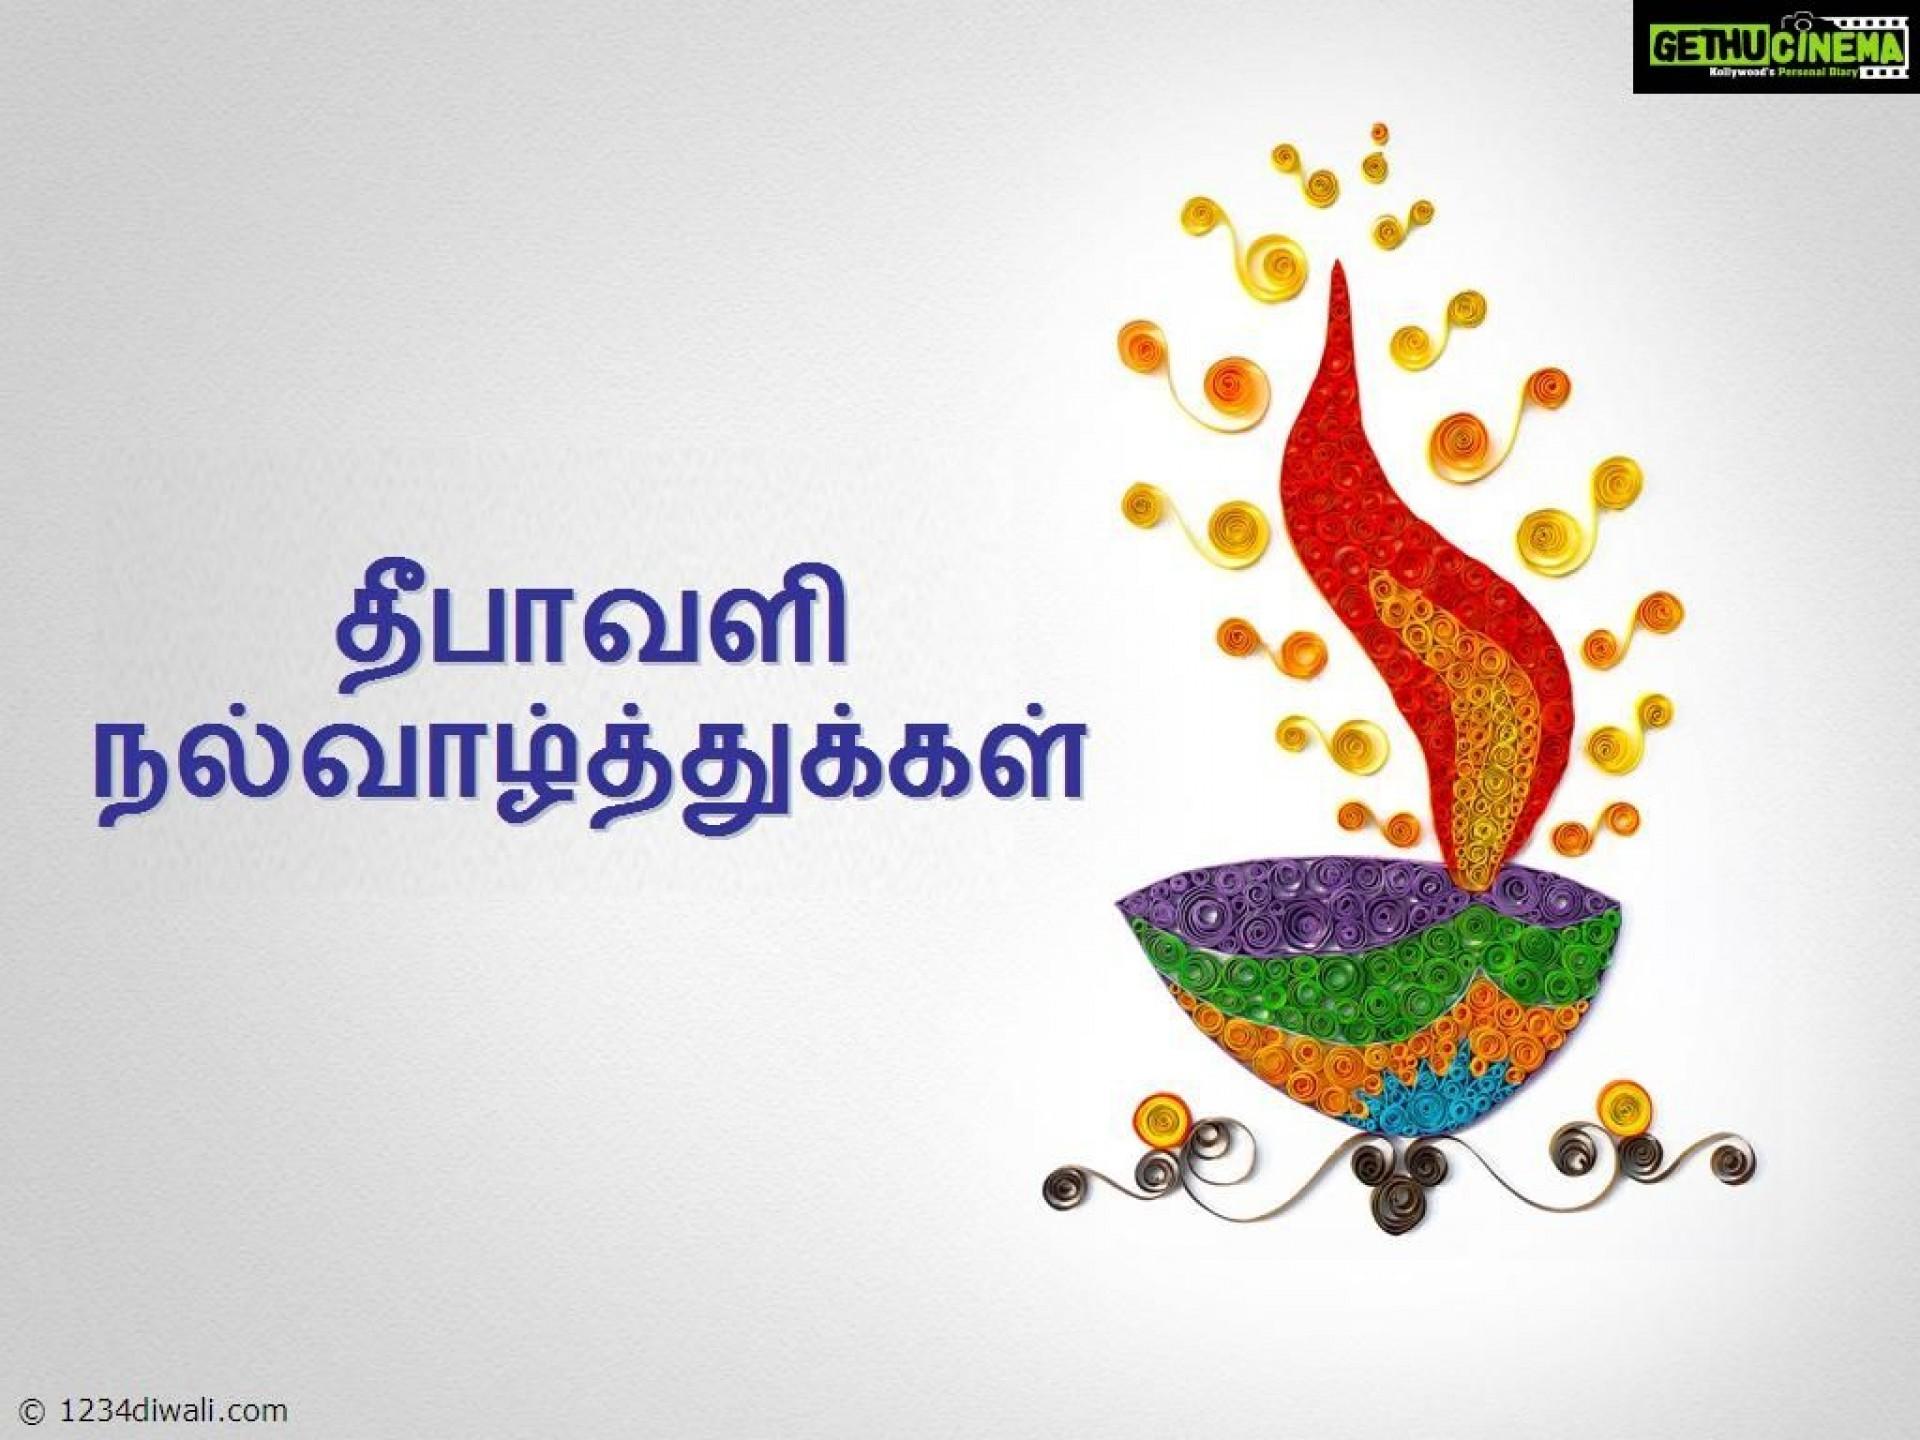 021 Deepavali Festival Essay In Tamil Unbelievable Christmas Language Diwali 1920